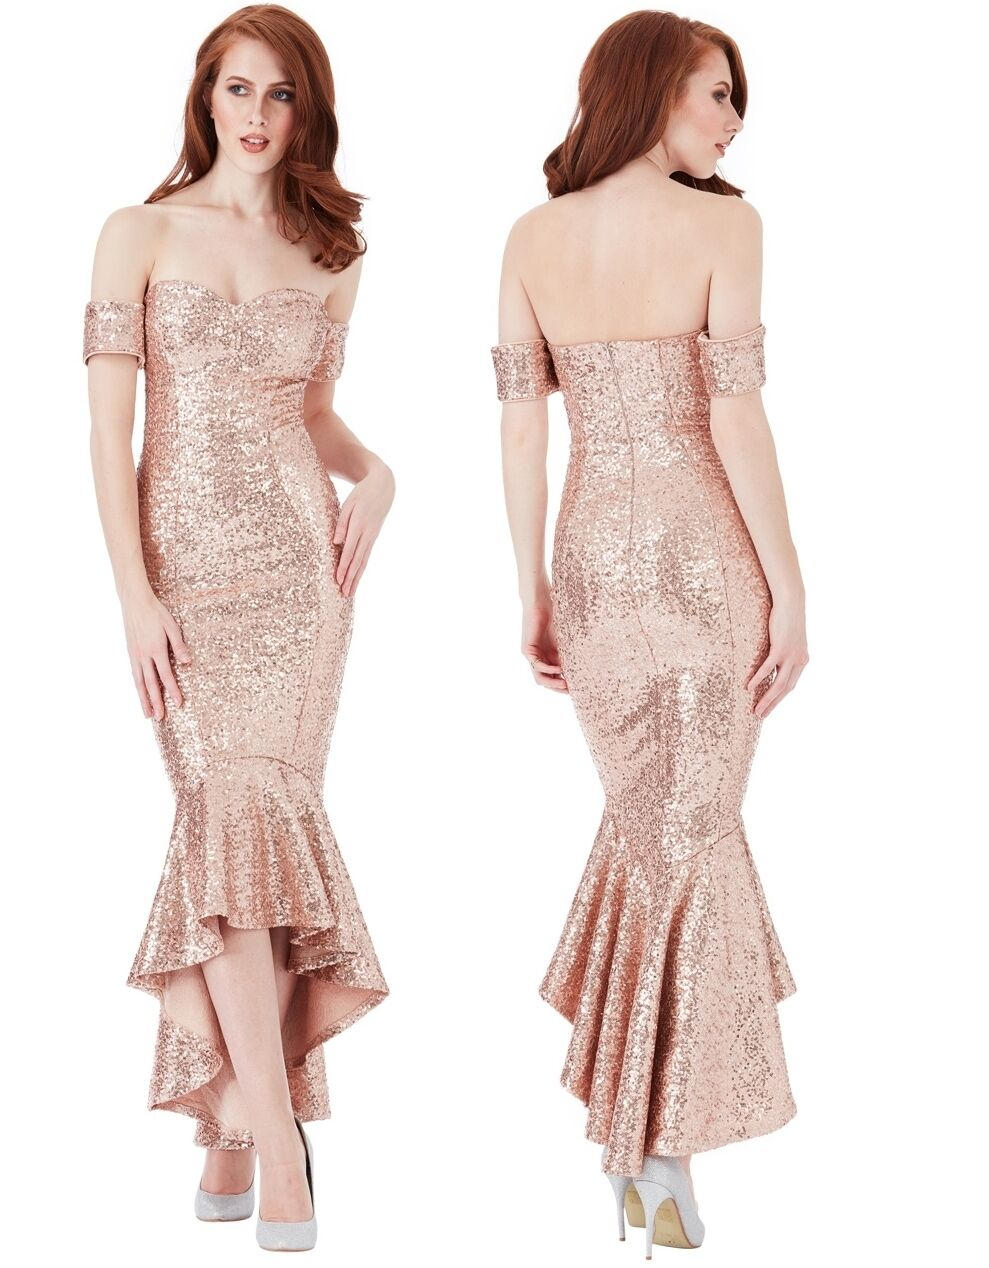 Goddiva Champagne Sequin Bardot Peplum Fshtail Prom Formal Evening Party Dress